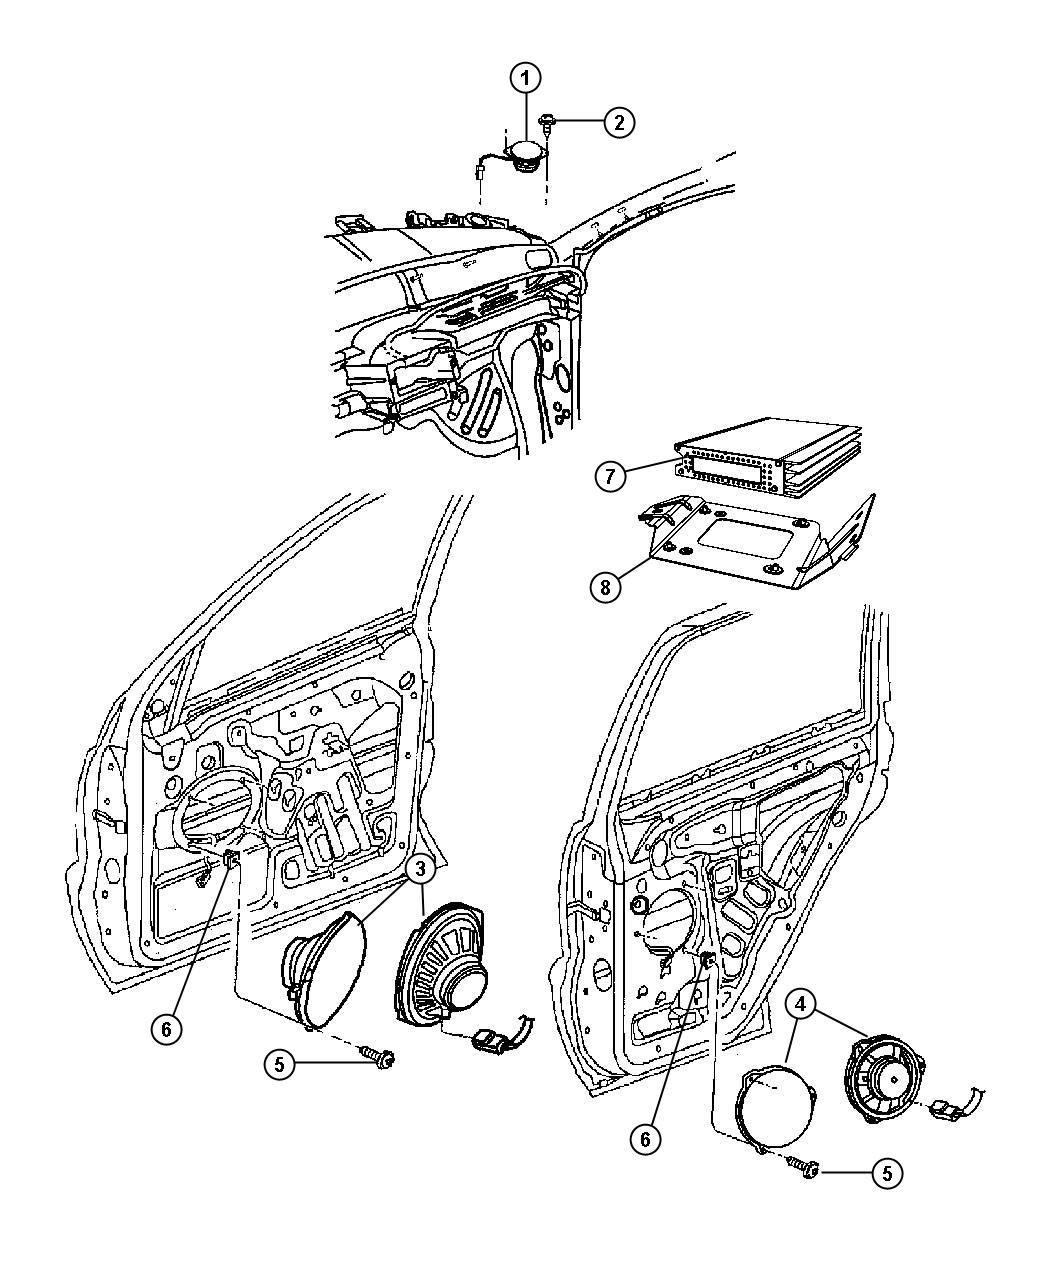 Diagram Boston Acoustics Jeep Patriot Wiring Diagram